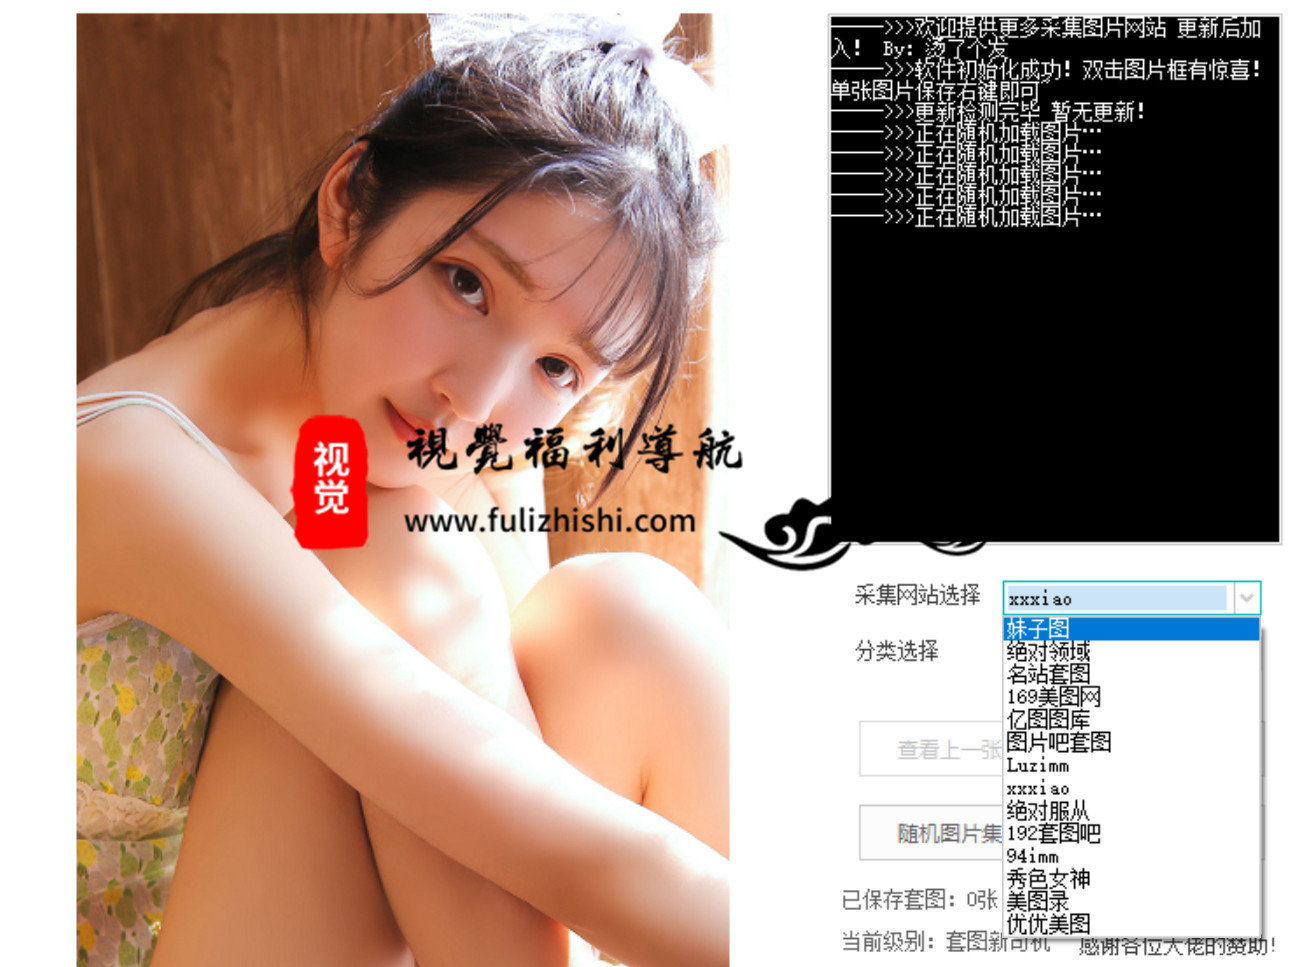 PC写真套图浏览采集工具插图1